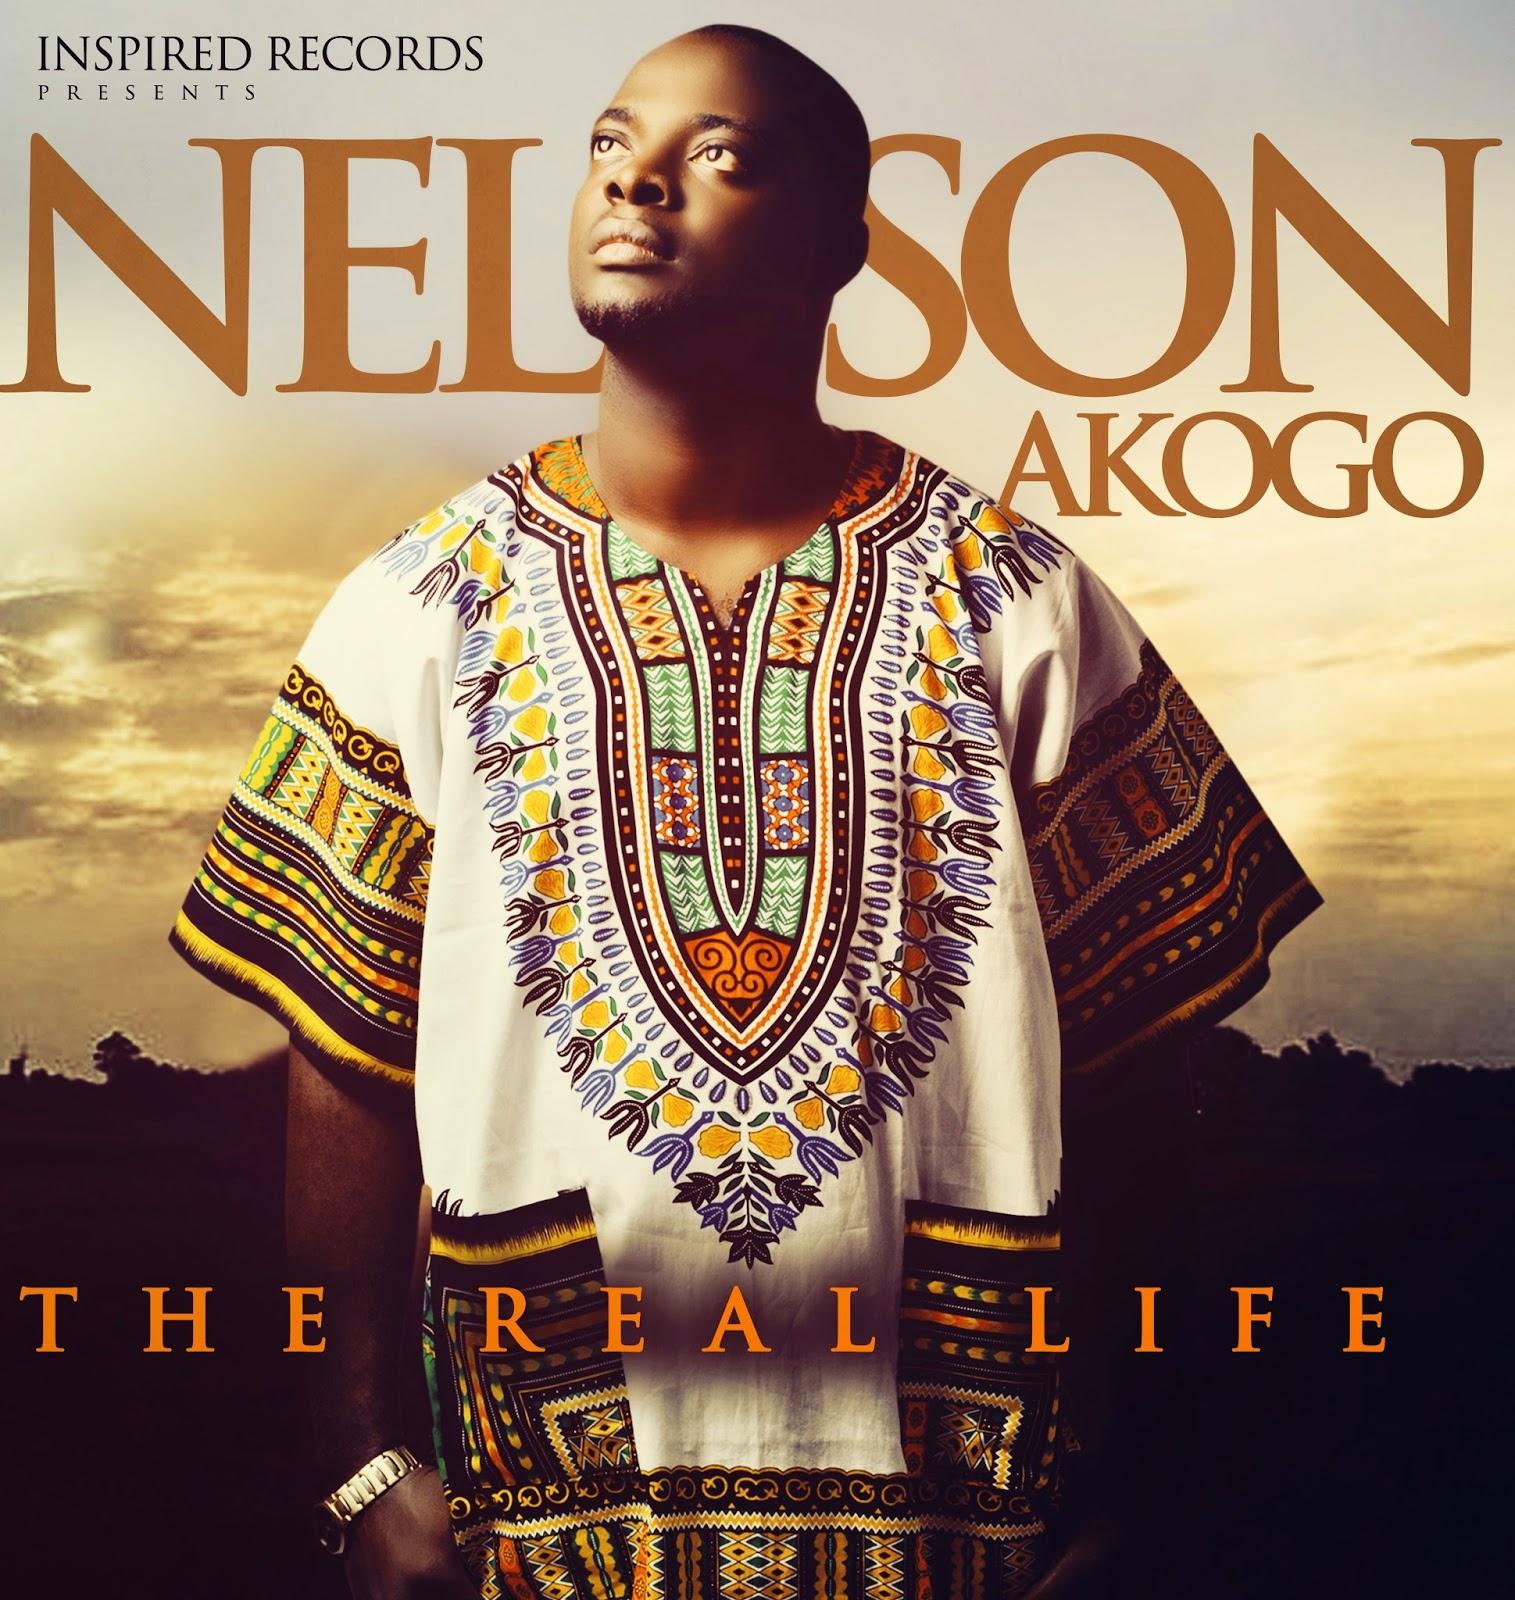 Nelson Akogo